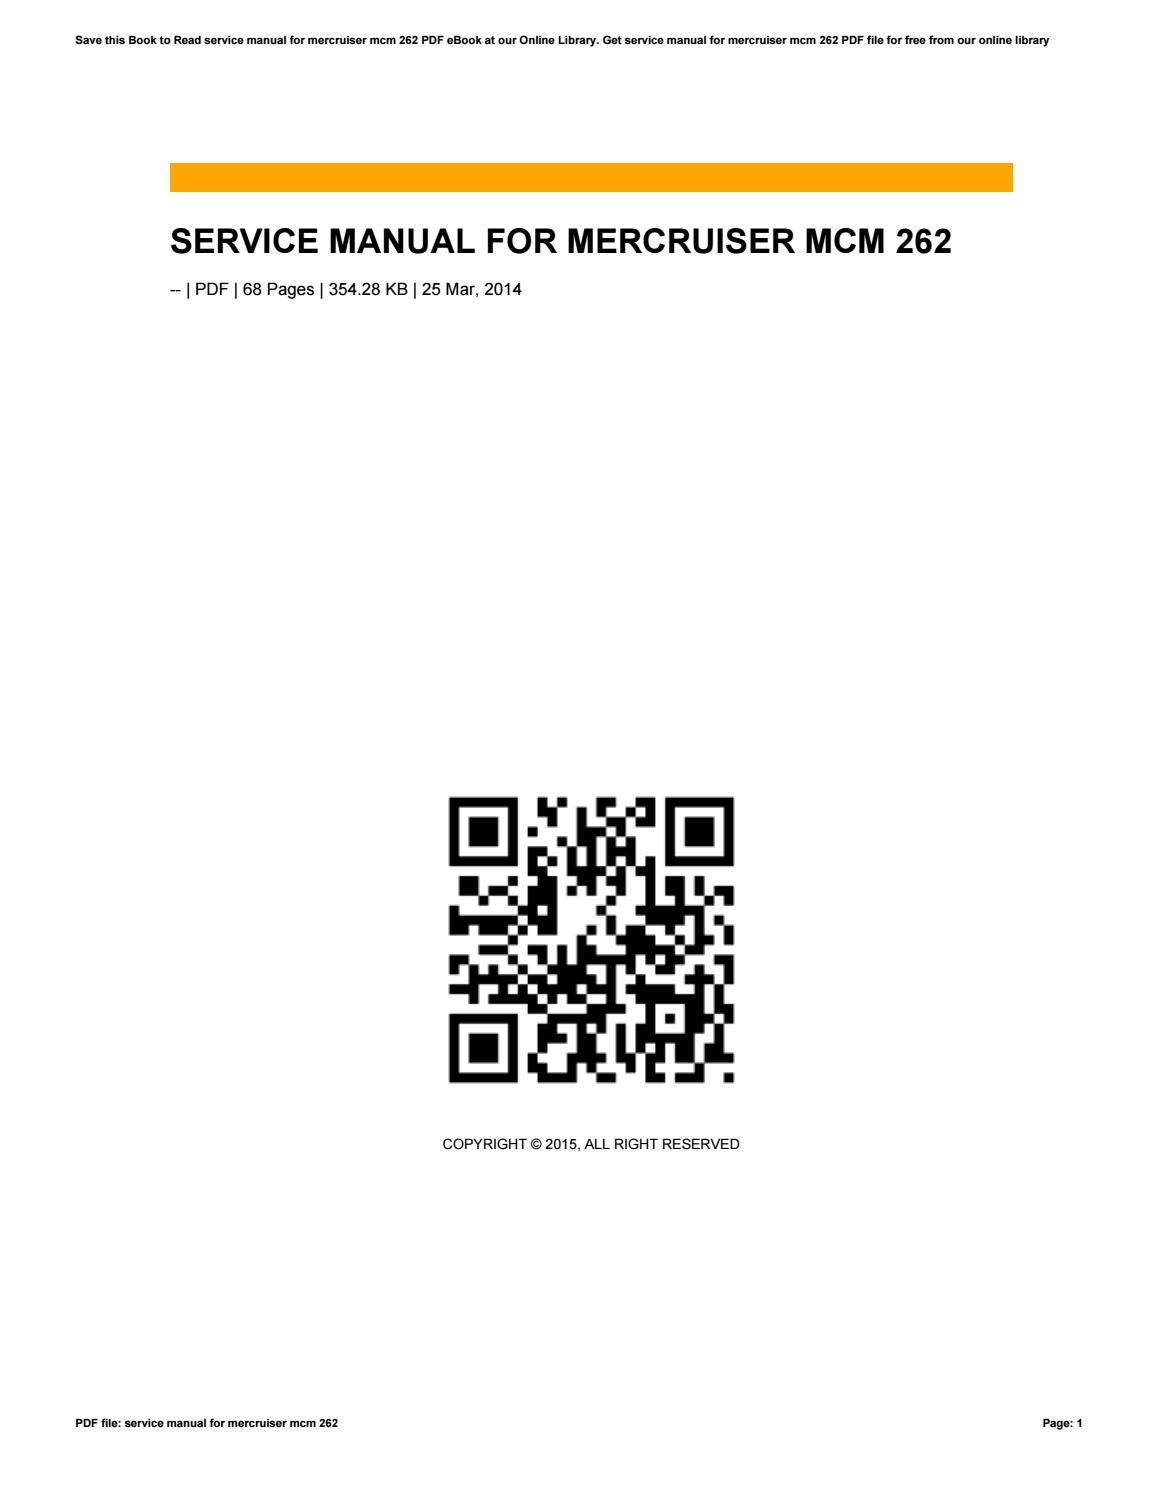 Service Manual For Mercruiser Mcm 262 Good Owner Guide Website Wiring Diagram By Lianti87sukaya Issuu Rh Com Fuel Pump